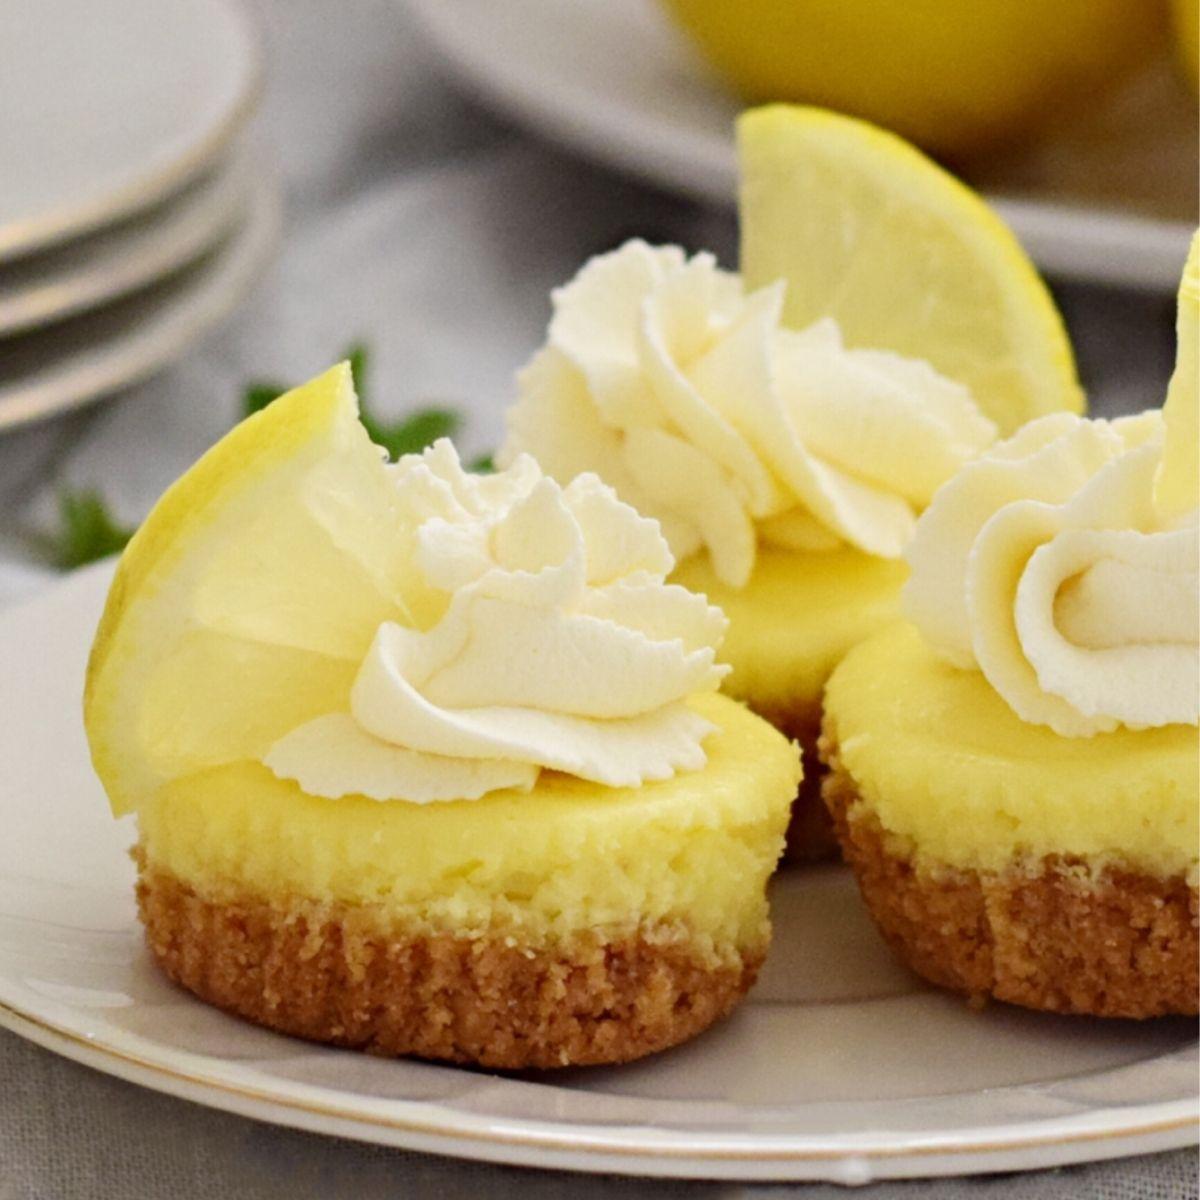 Delicious Mini Baked Lemon Cheesecake